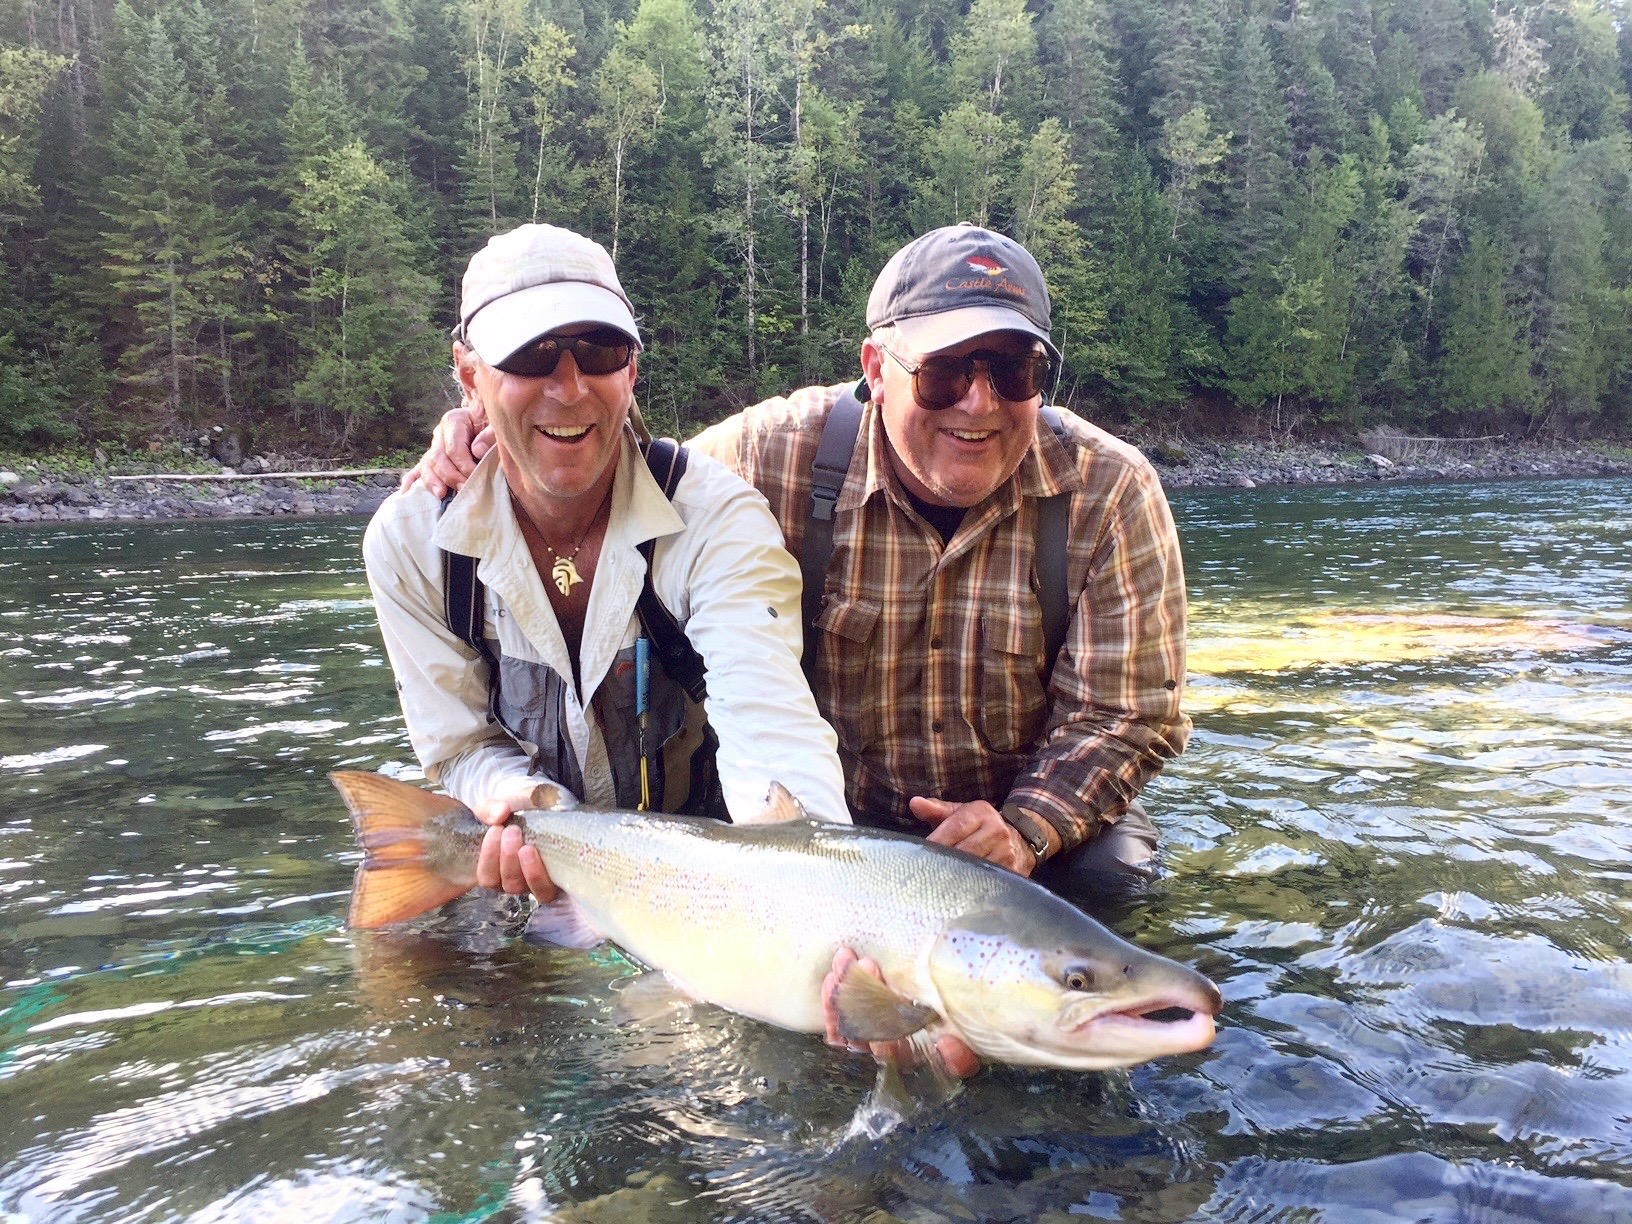 David Castleman (Right) with Camp Bonaventure guide Marc poirier, congratulations David!